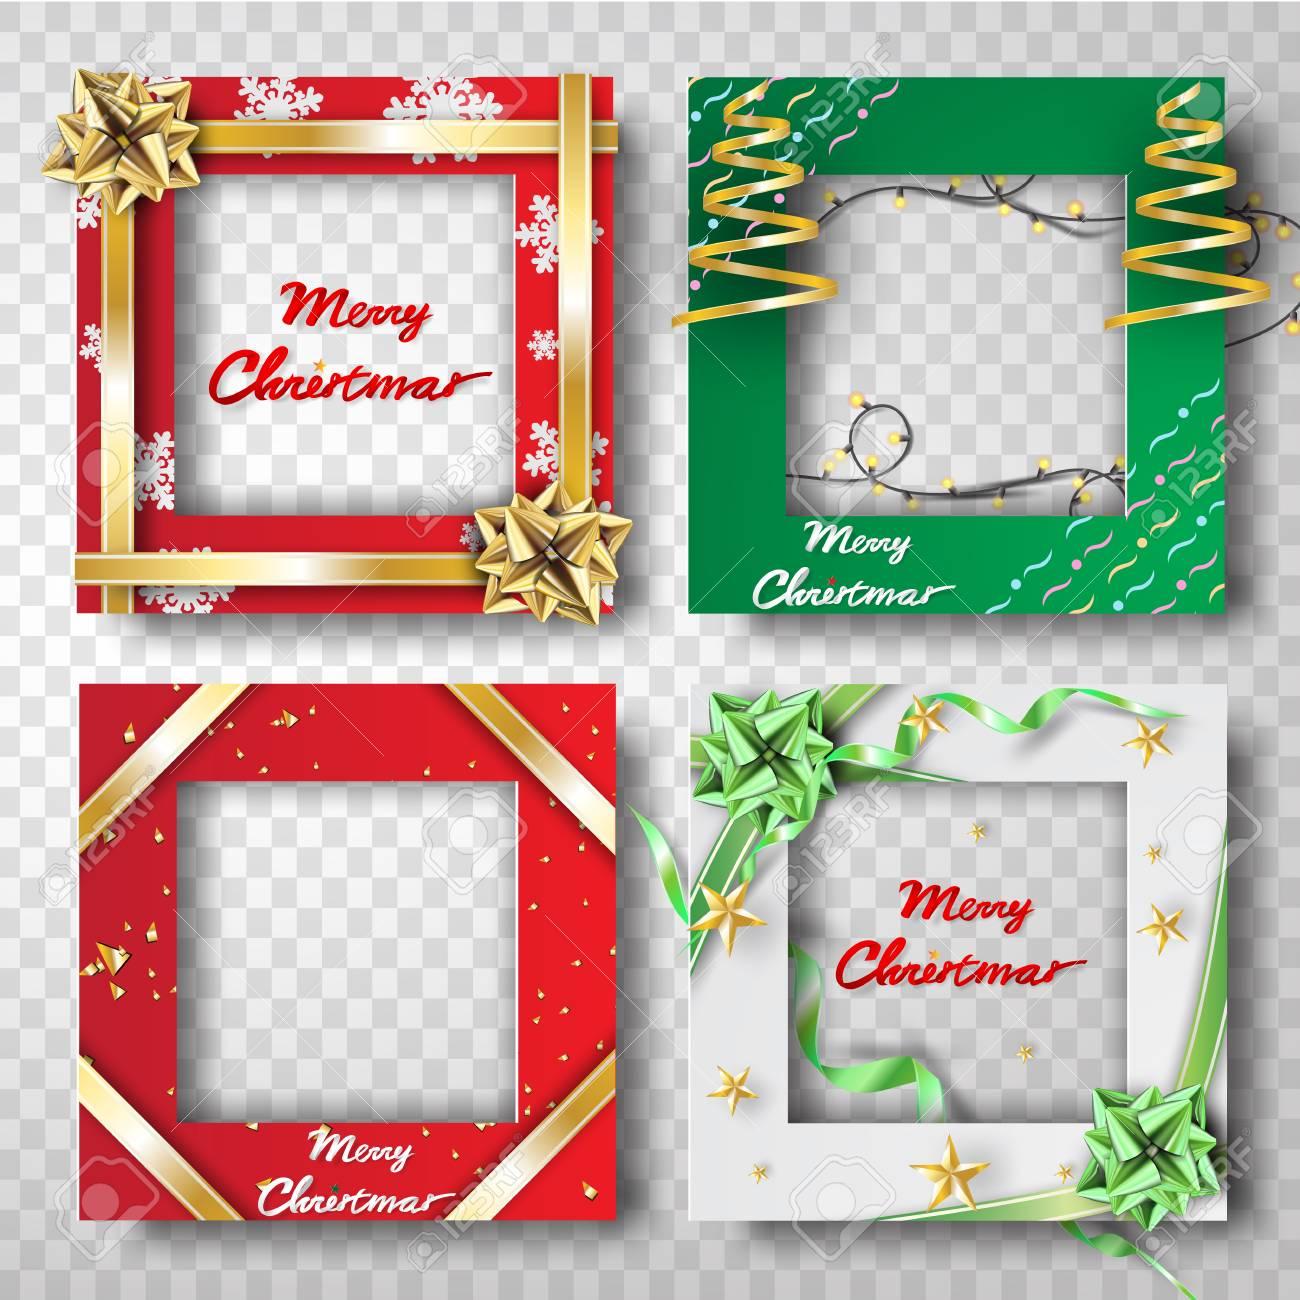 Paper Art And Craft Of Christmas Border Frame Photo Design Set